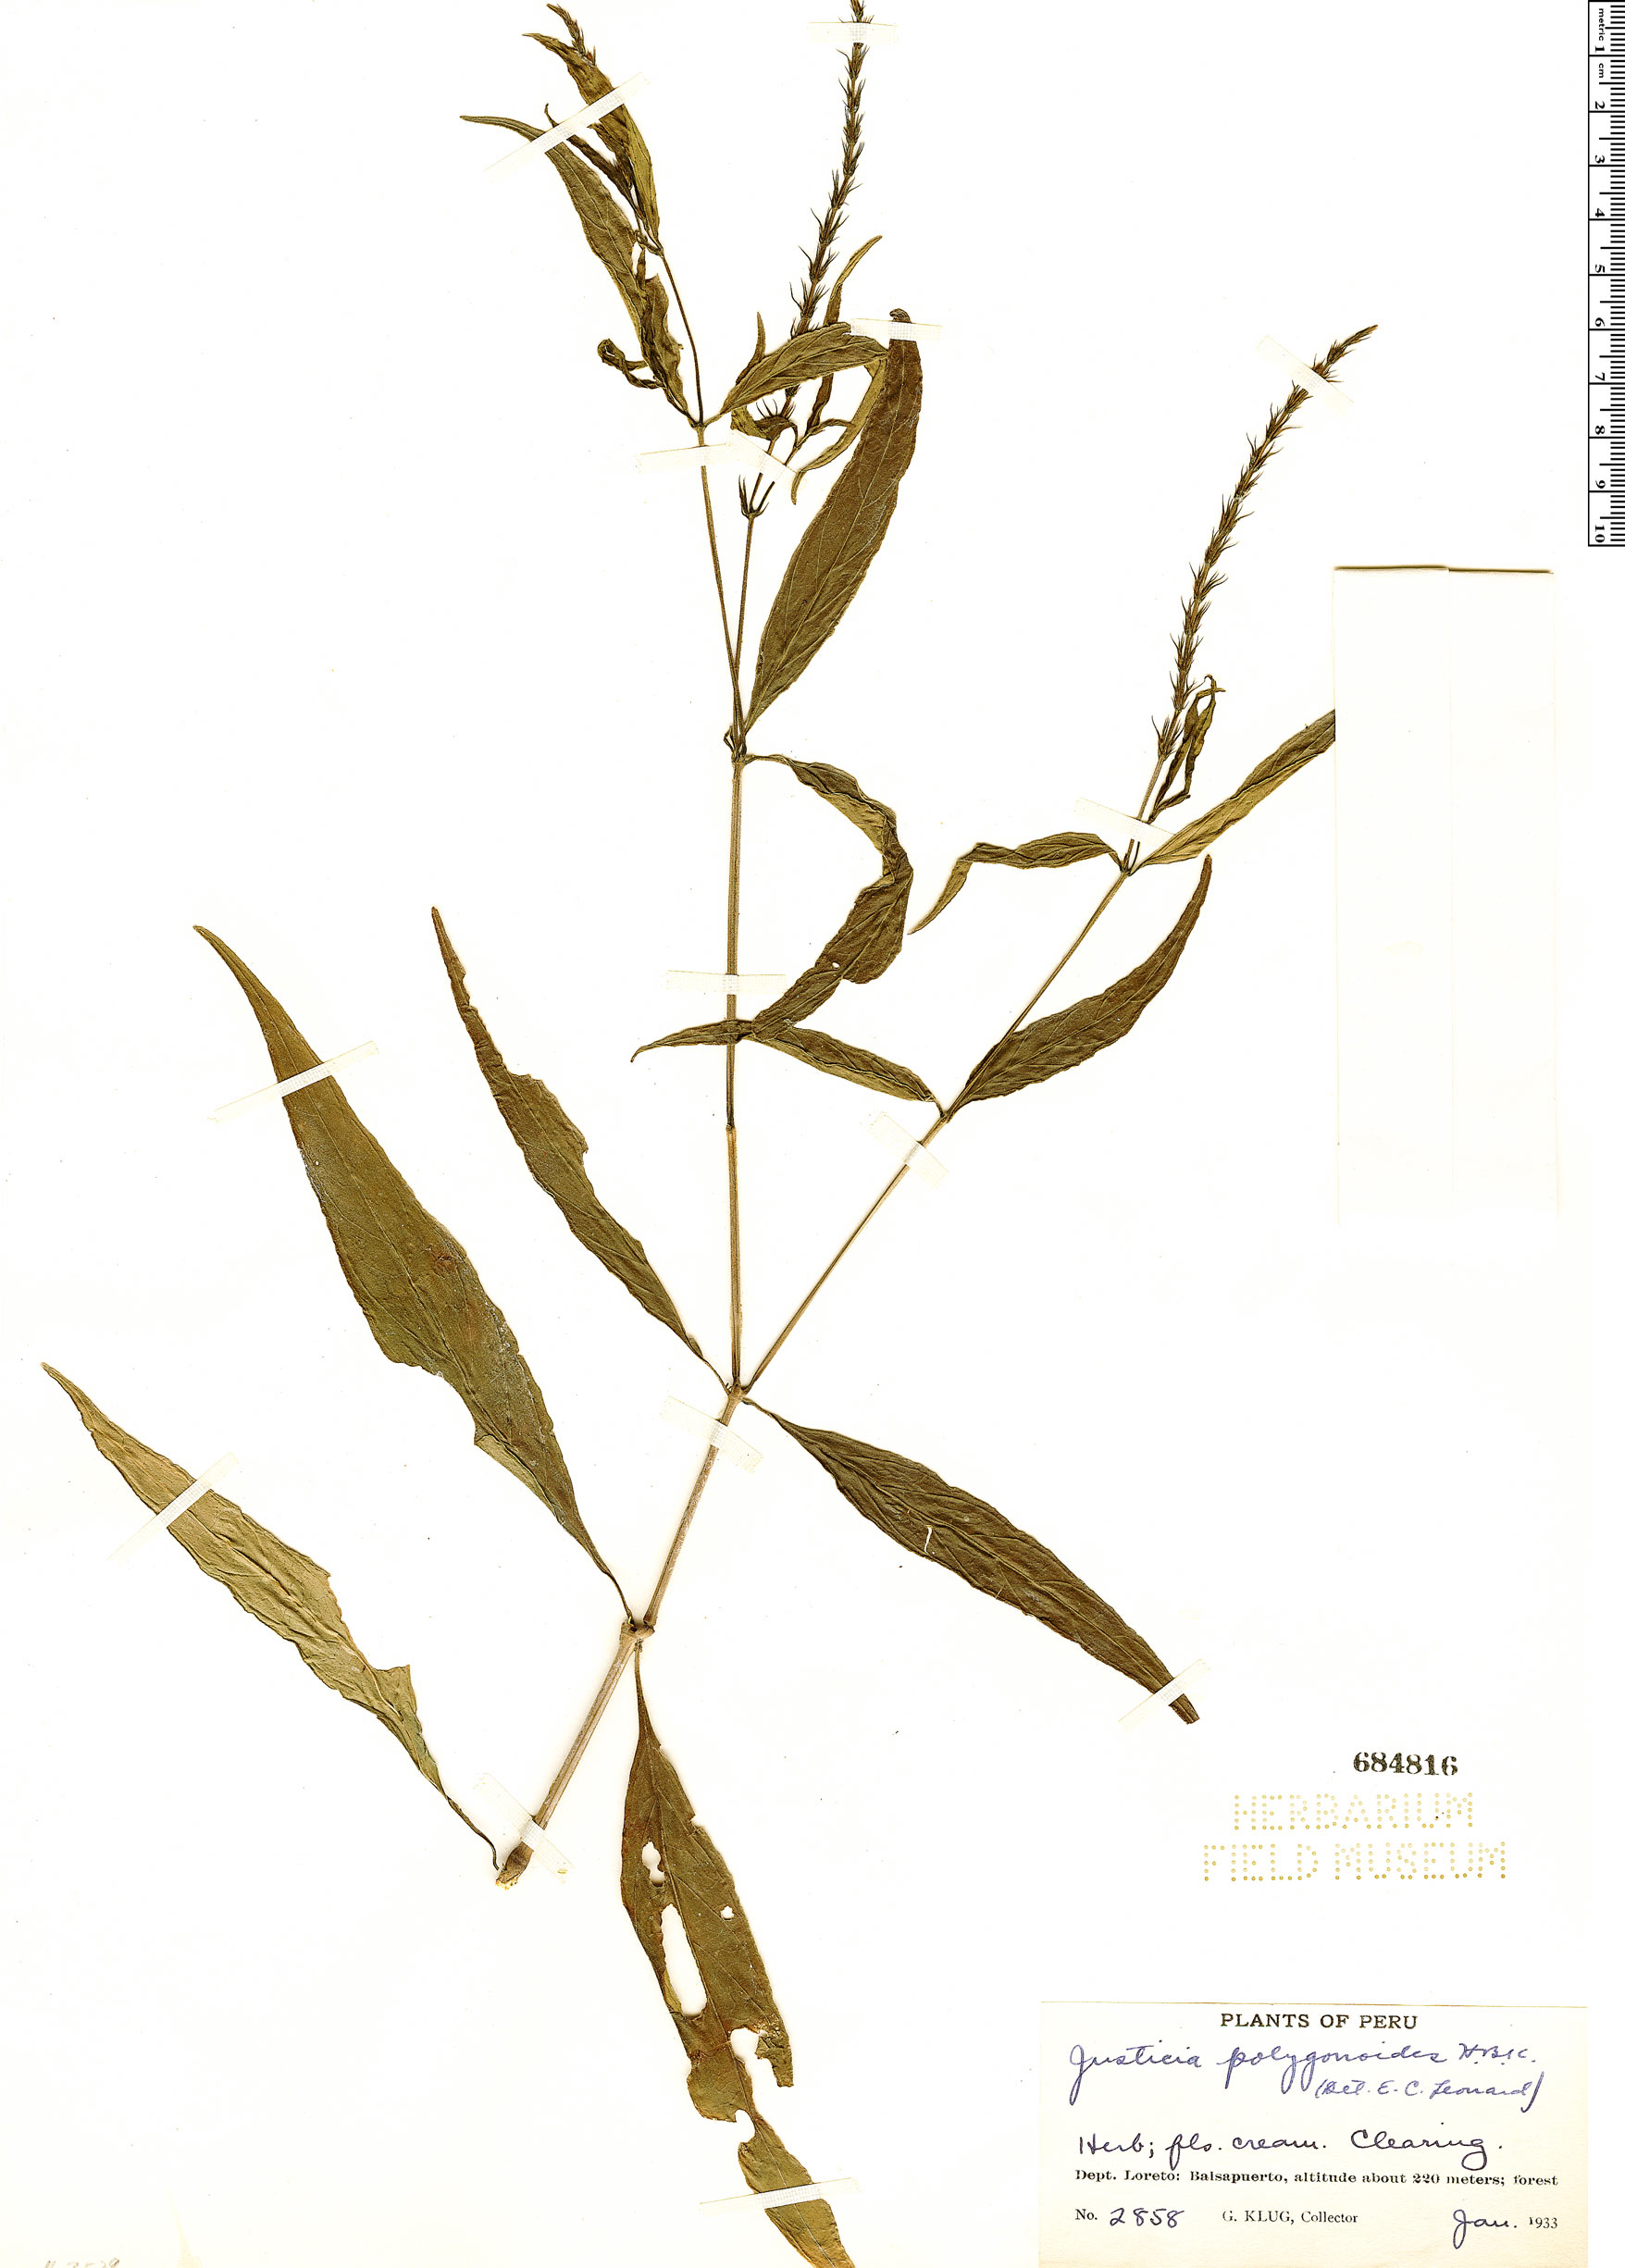 Specimen: Justicia polygonoides